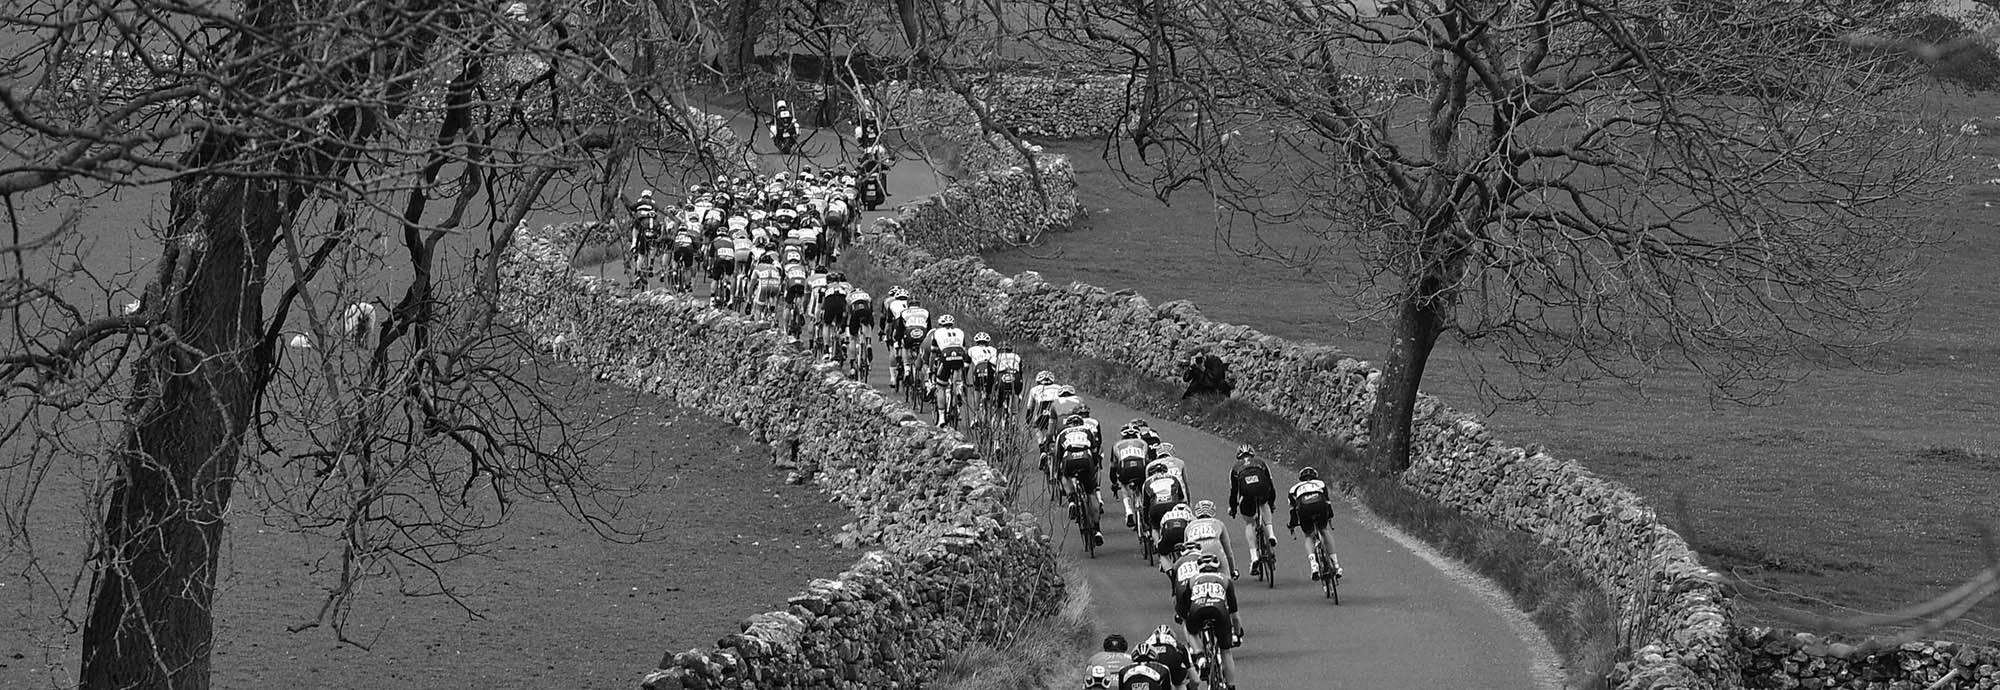 Header: History - Tour de Yorkshire